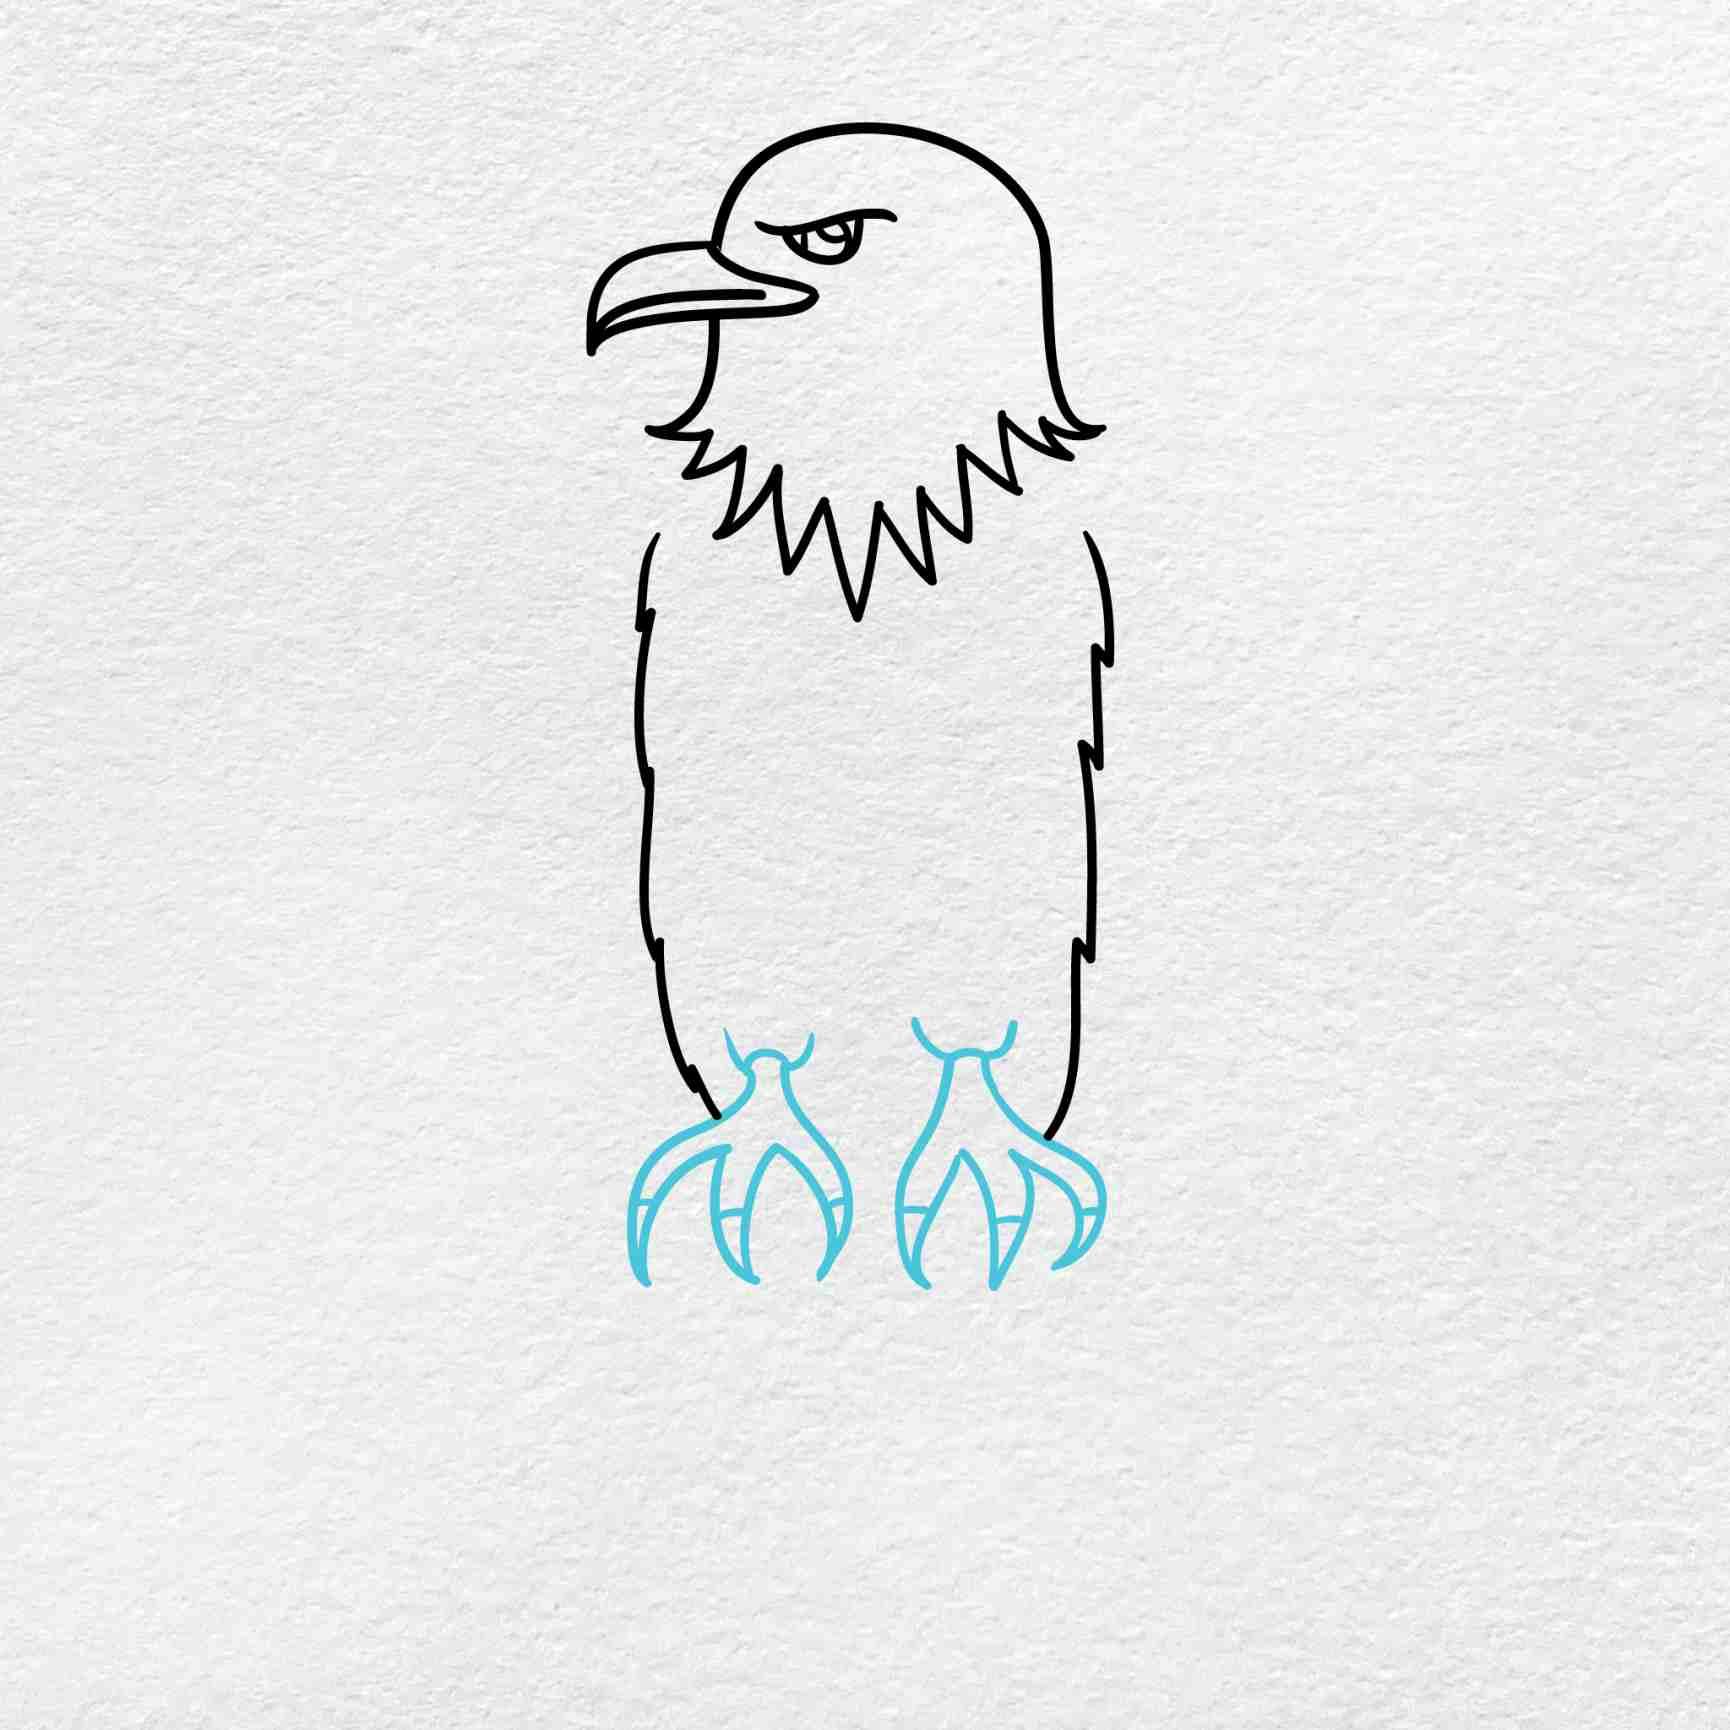 Bald Eagle Drawing: Step 4